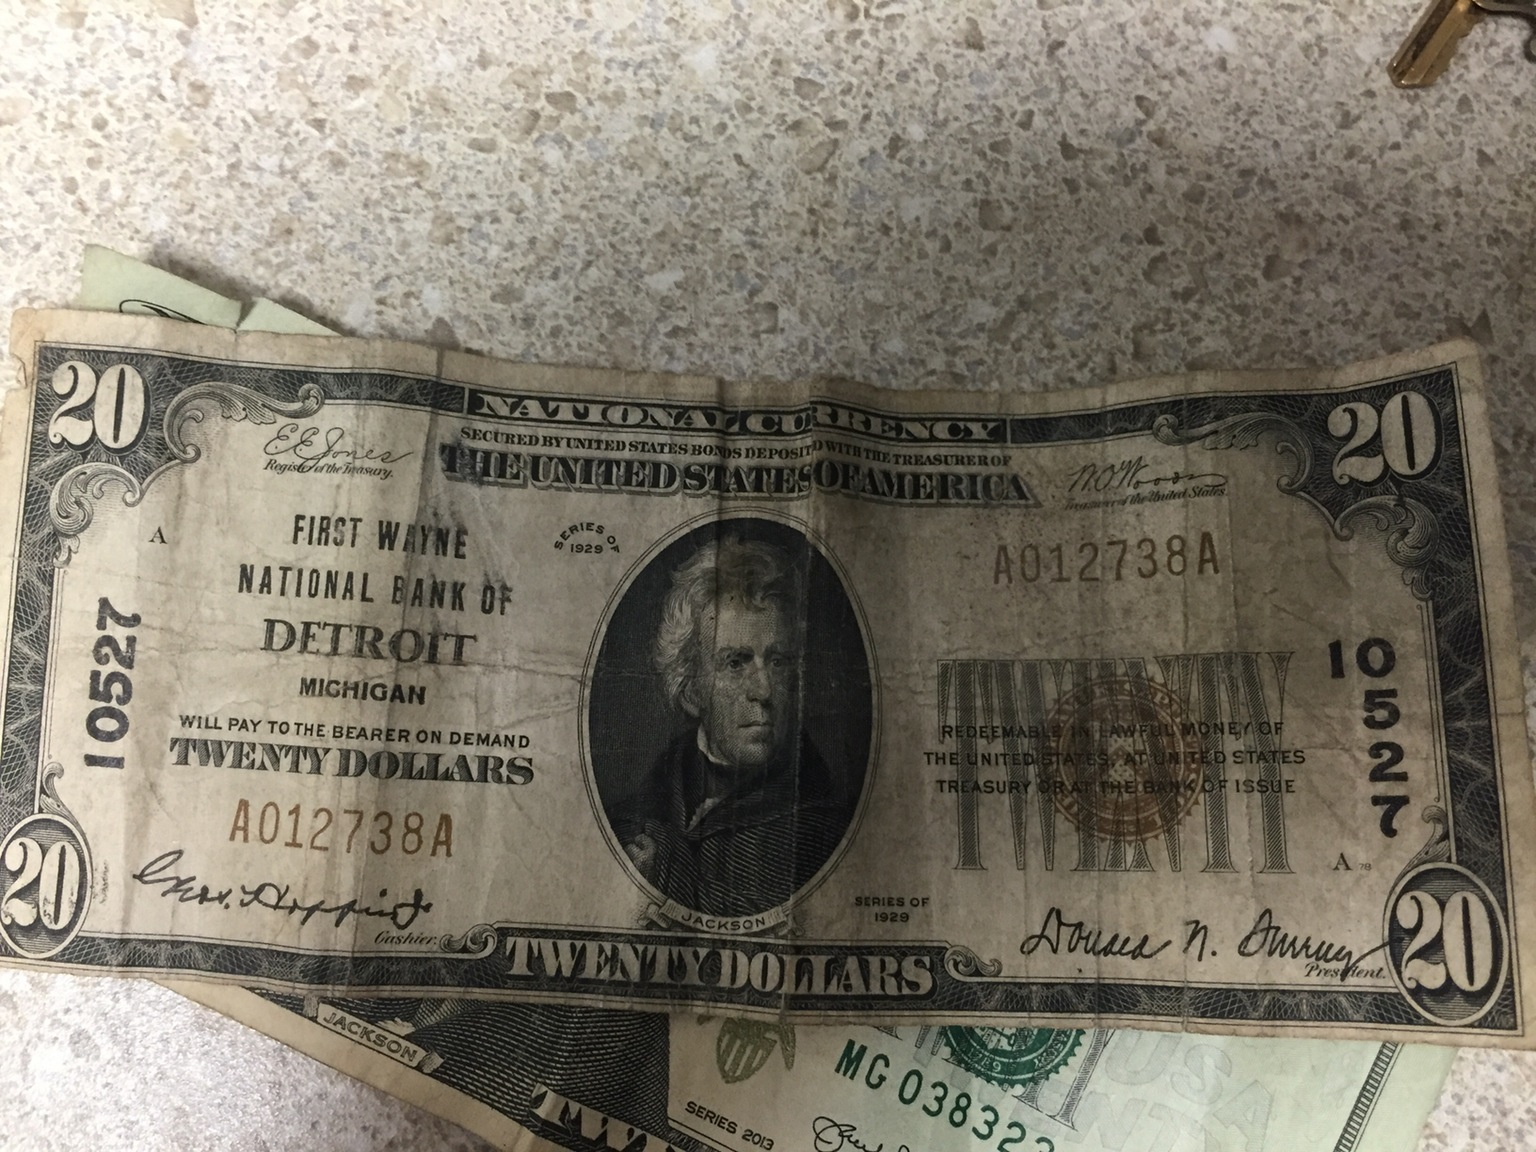 Easily the oldest bill I've ever seen